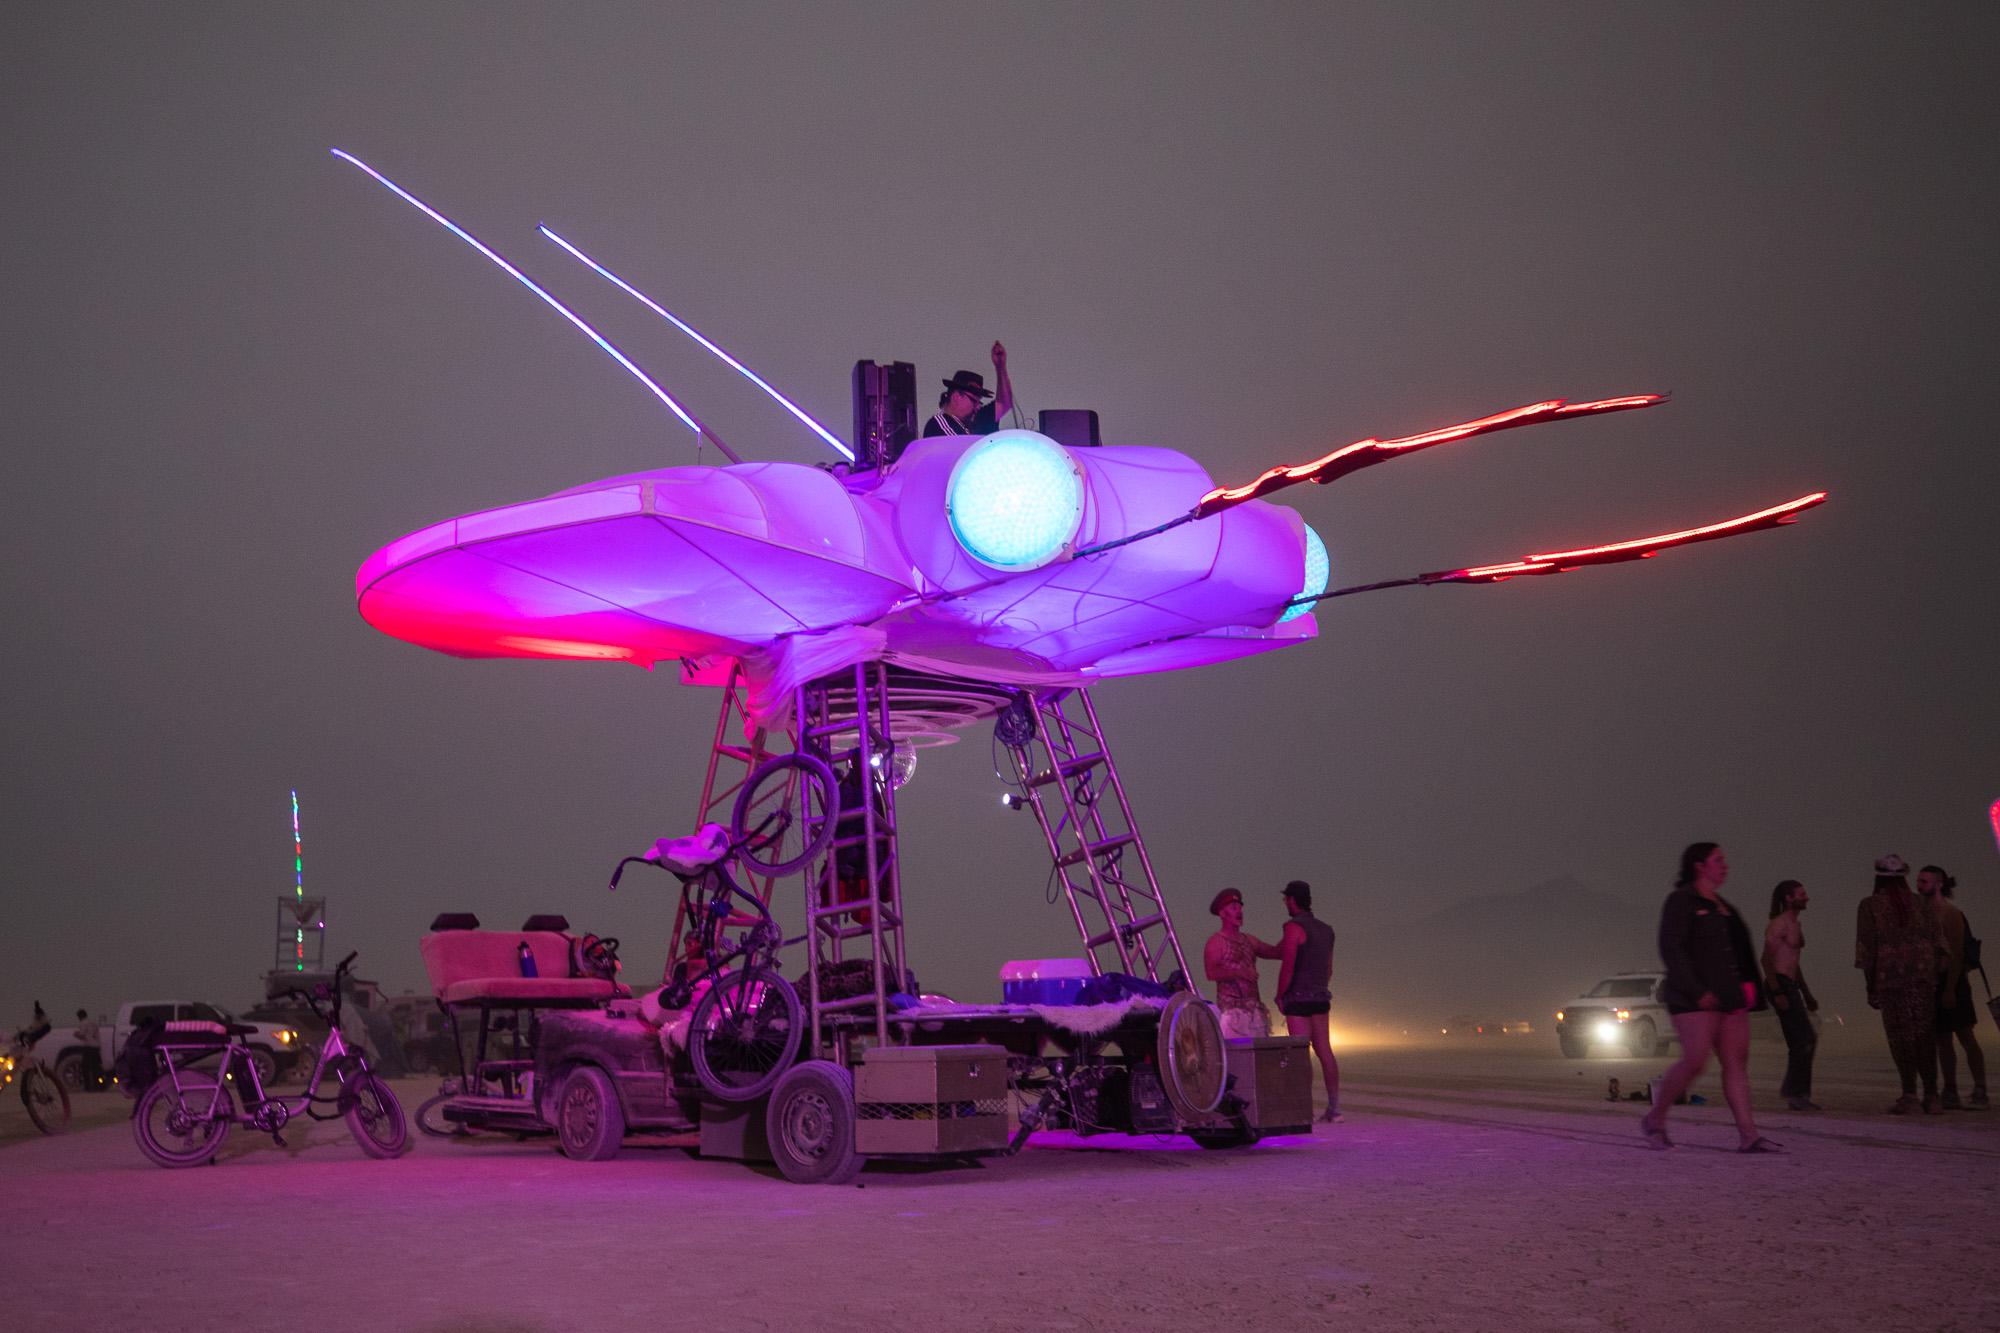 Burning Man 2021 dragonfly art car